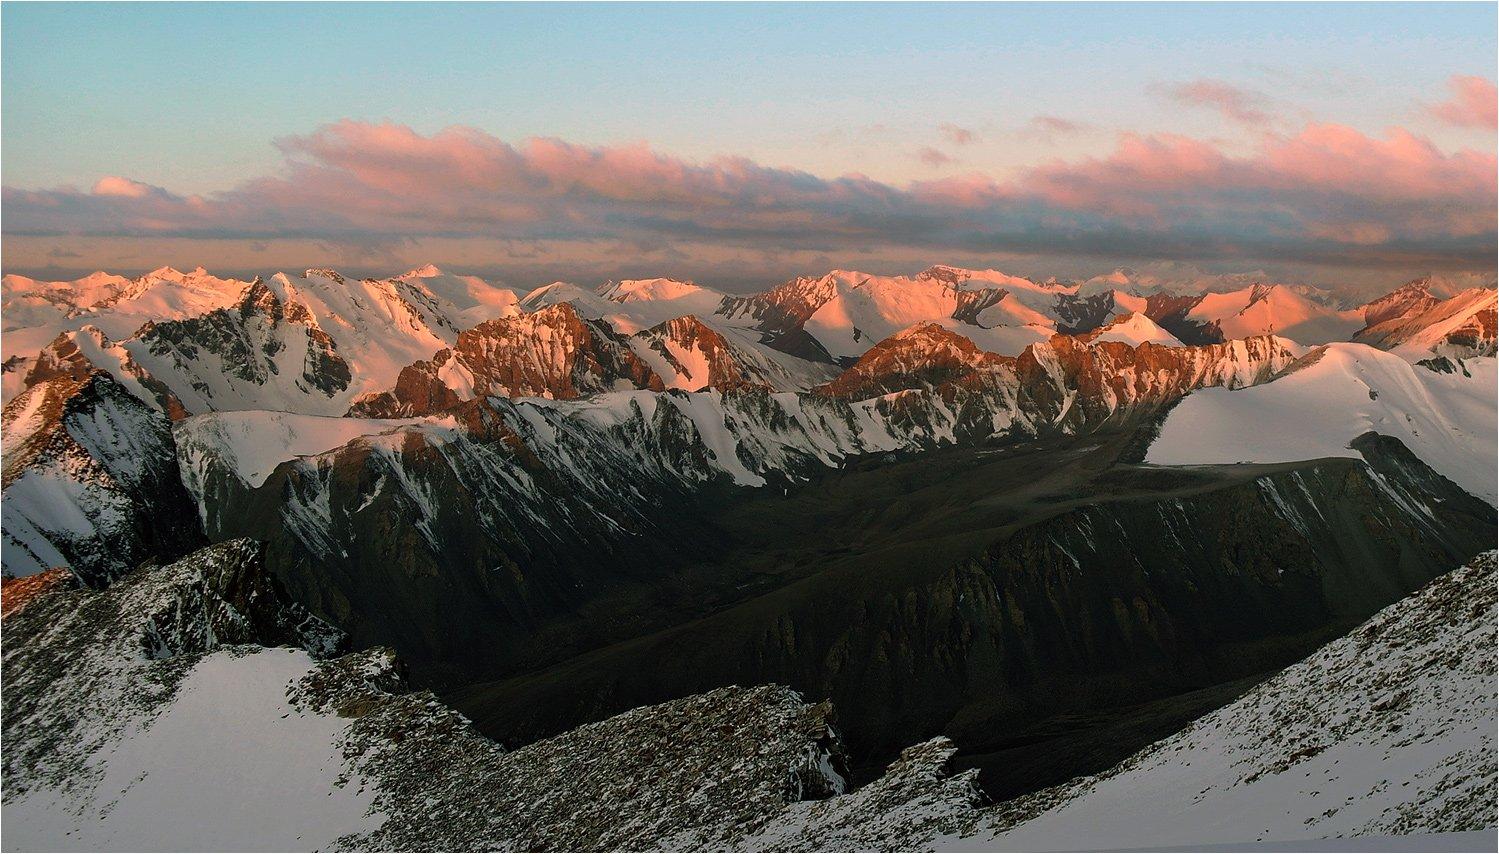 горы, памир, туризм, альпинизм, Иван Жданов